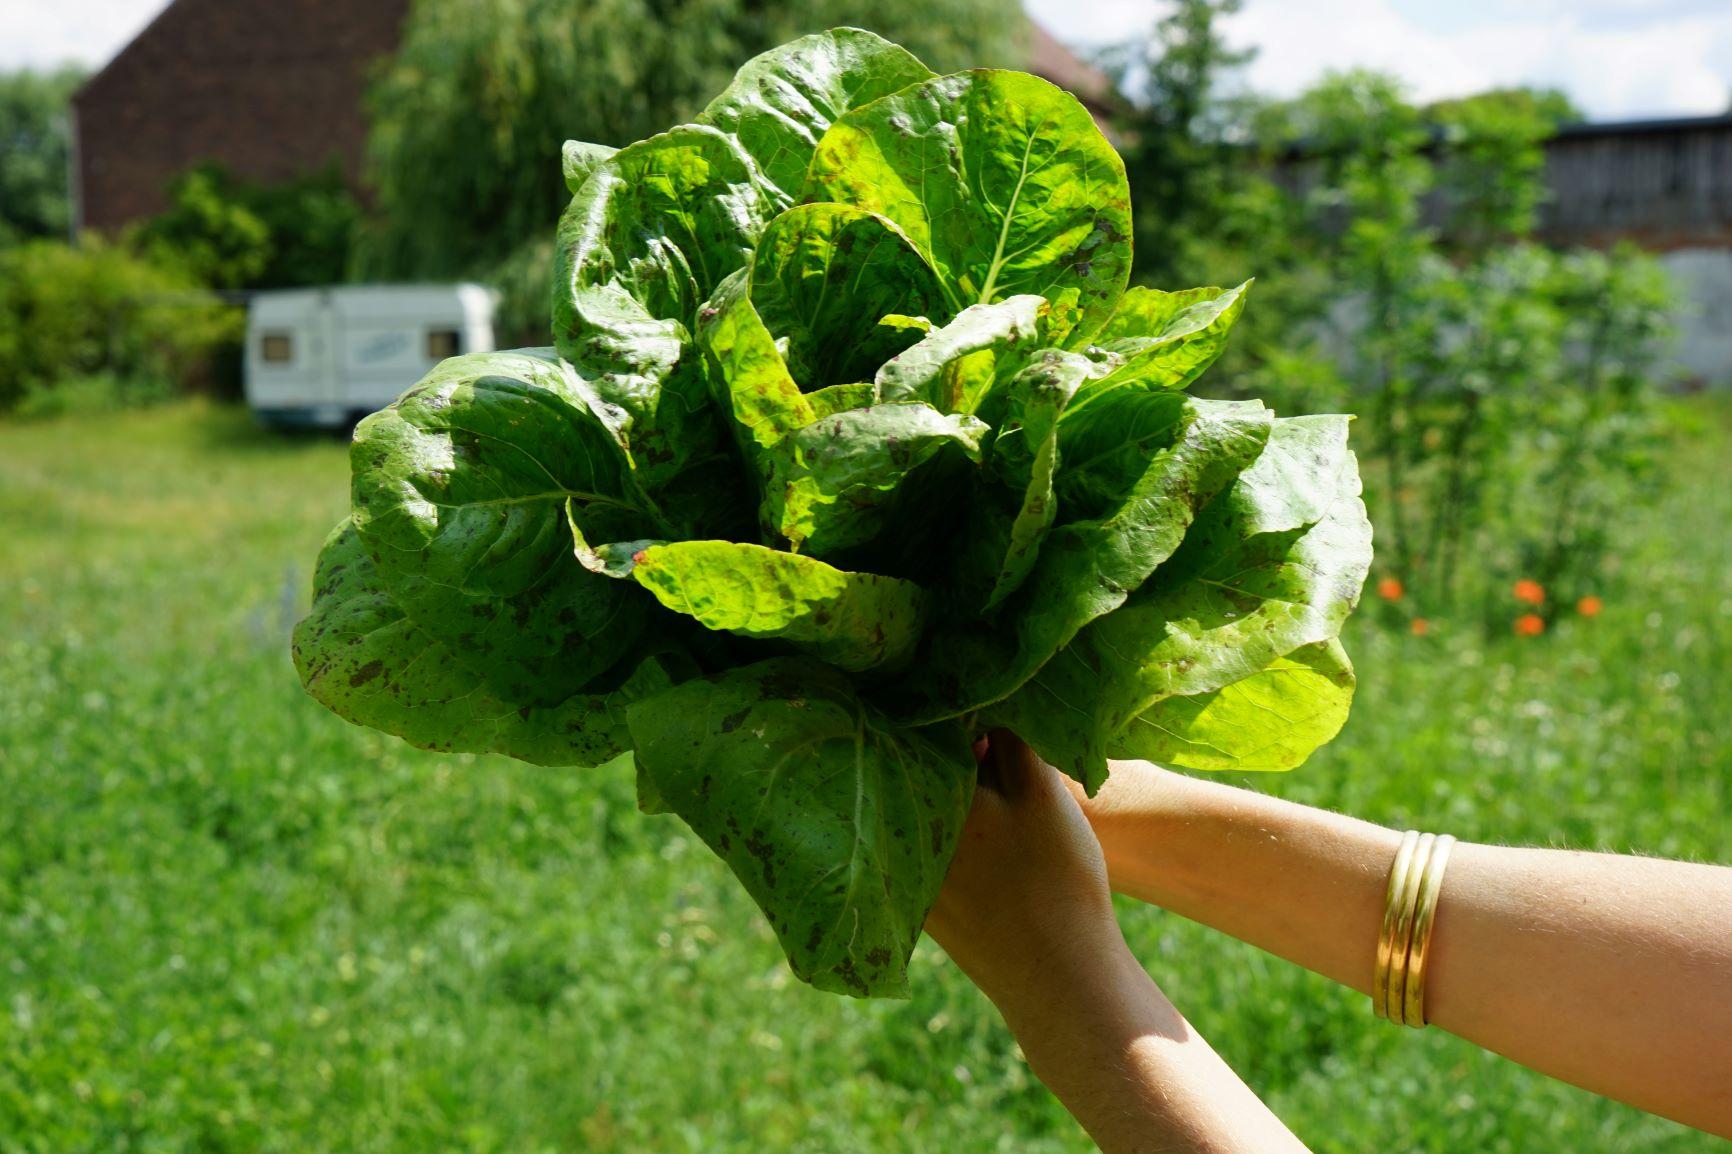 Salat - Schon einmal was von 'Forellenschluss' (Kopfsalat) oder 'Hohlblättrigem Butter' (Schnittsalat) gehört? Nein? Na dann ran ans Beet!